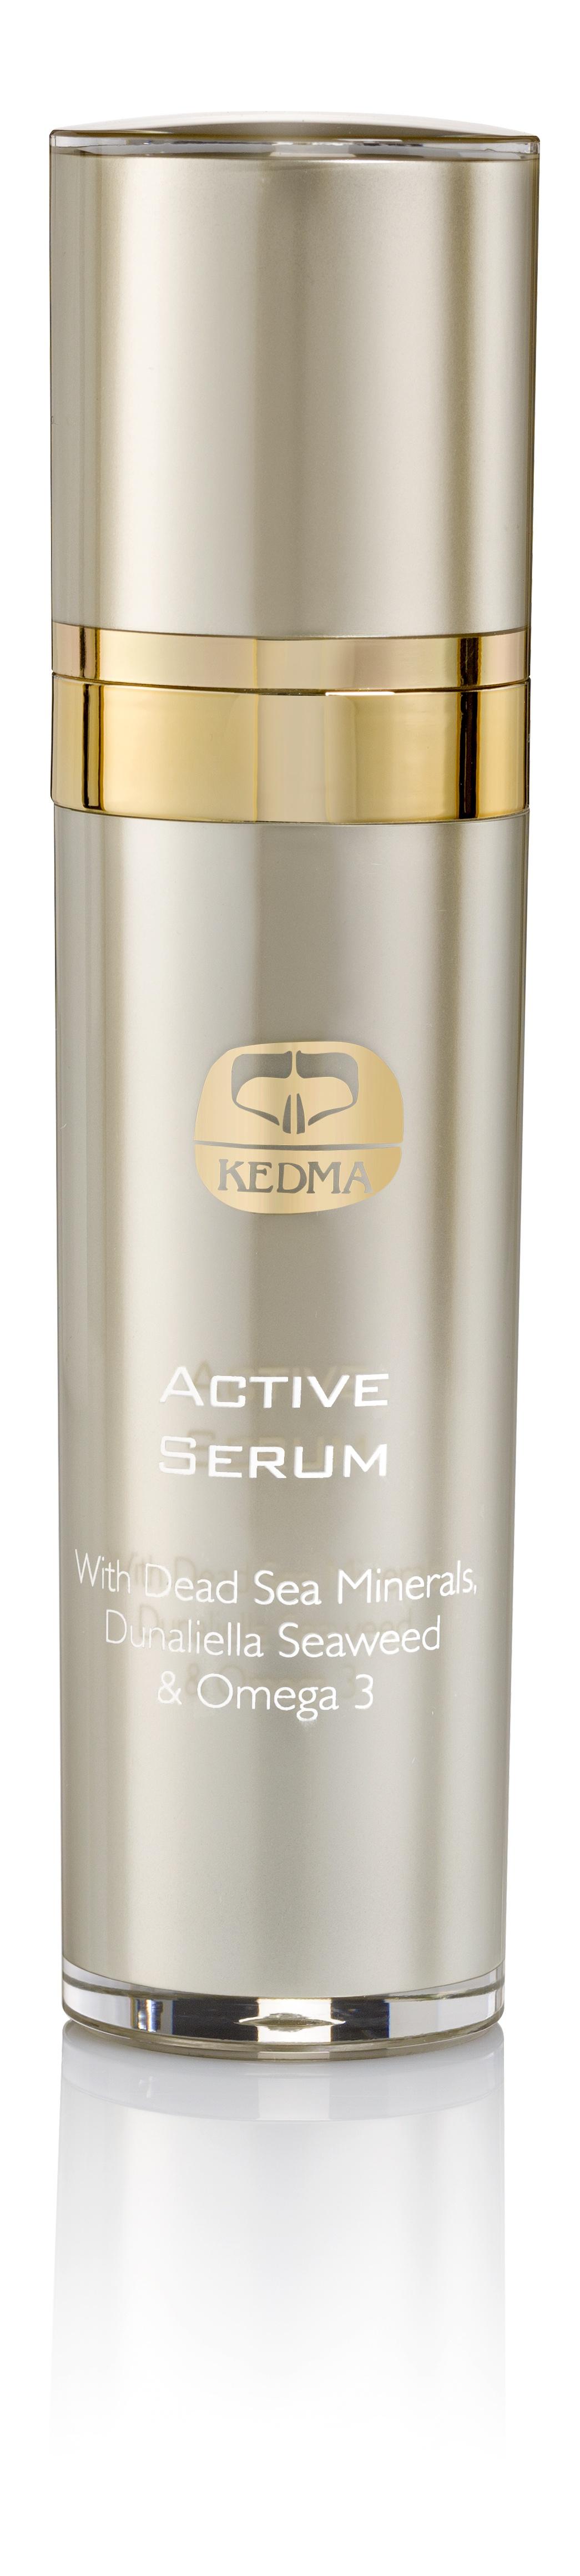 Kedma Royalty Active Serum